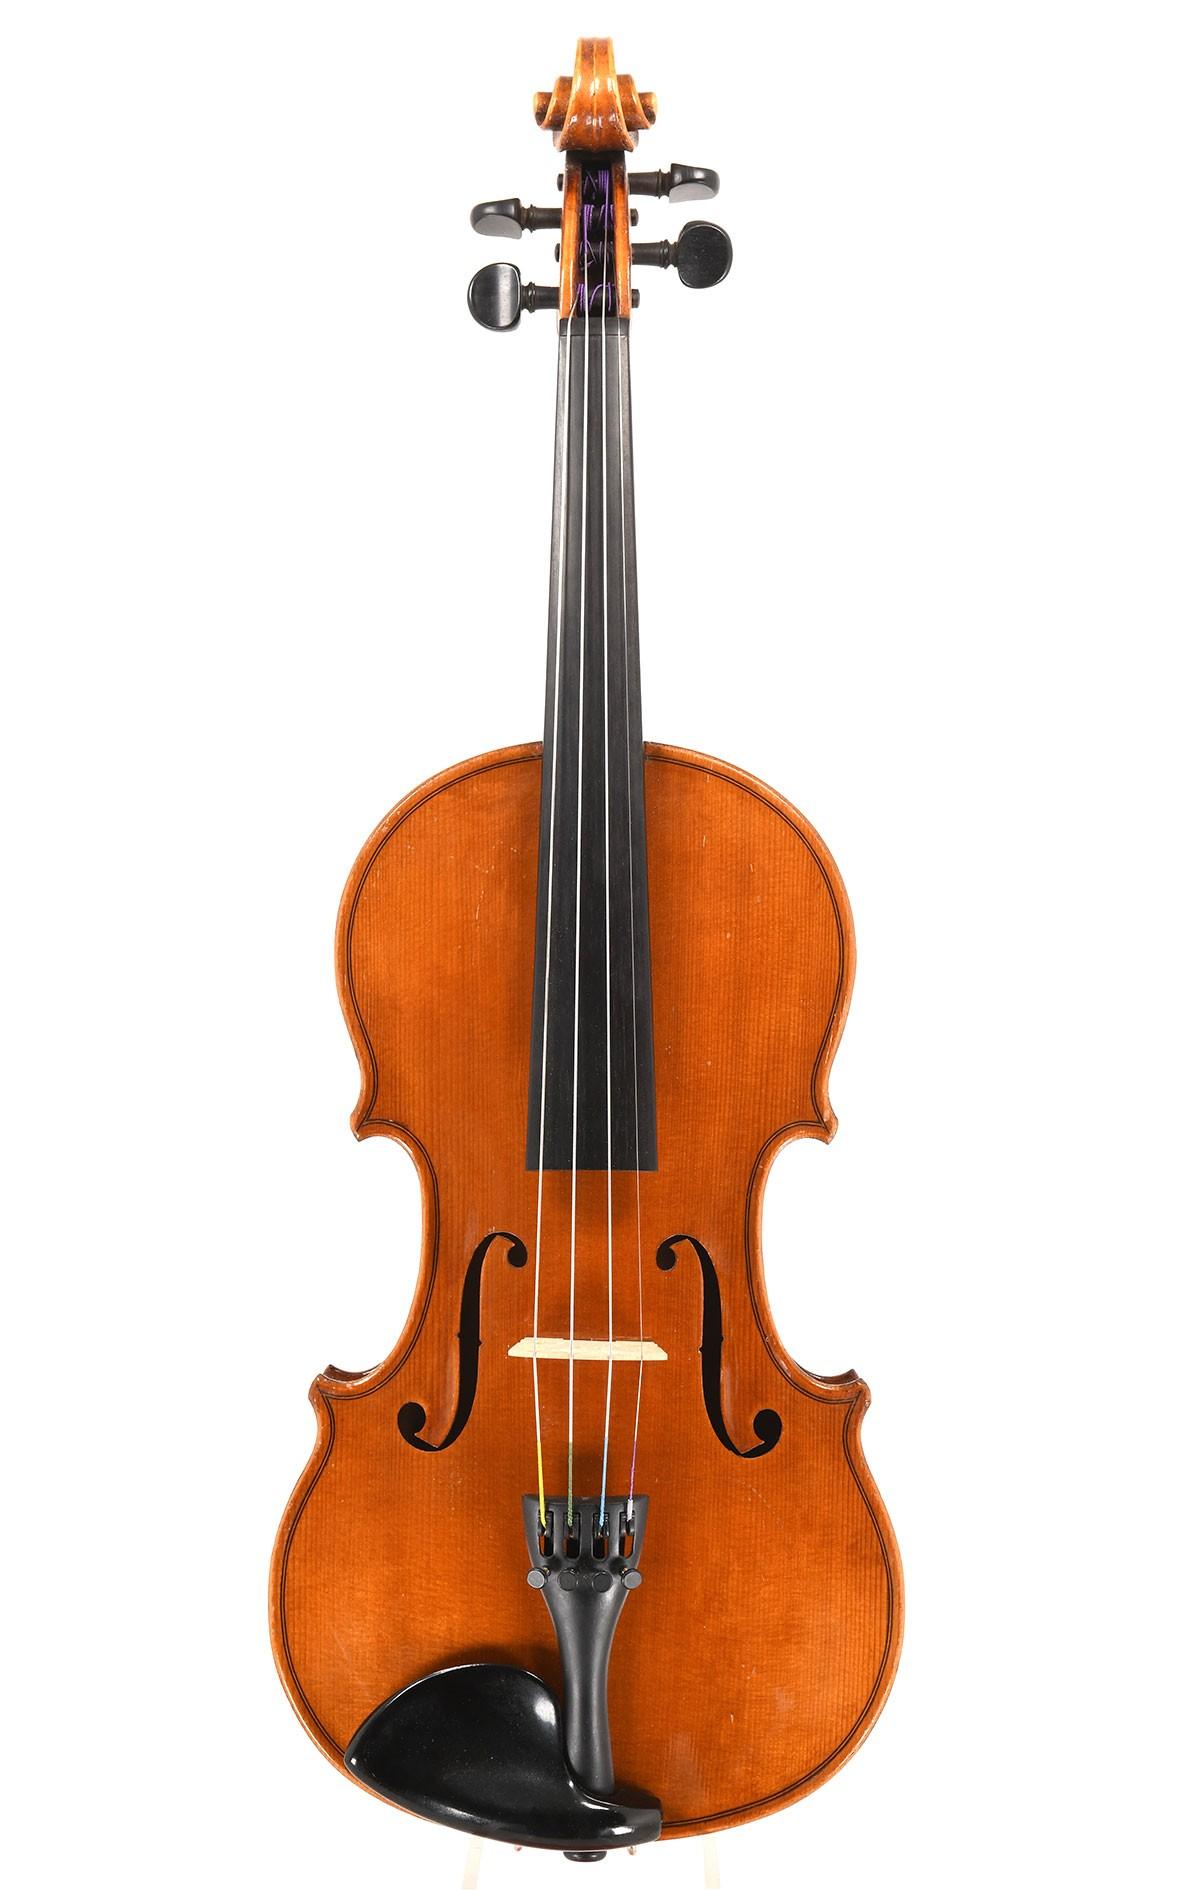 Violin from Markneukirchen (Bad Elster), c.1980 - master violin maker Emil Barth